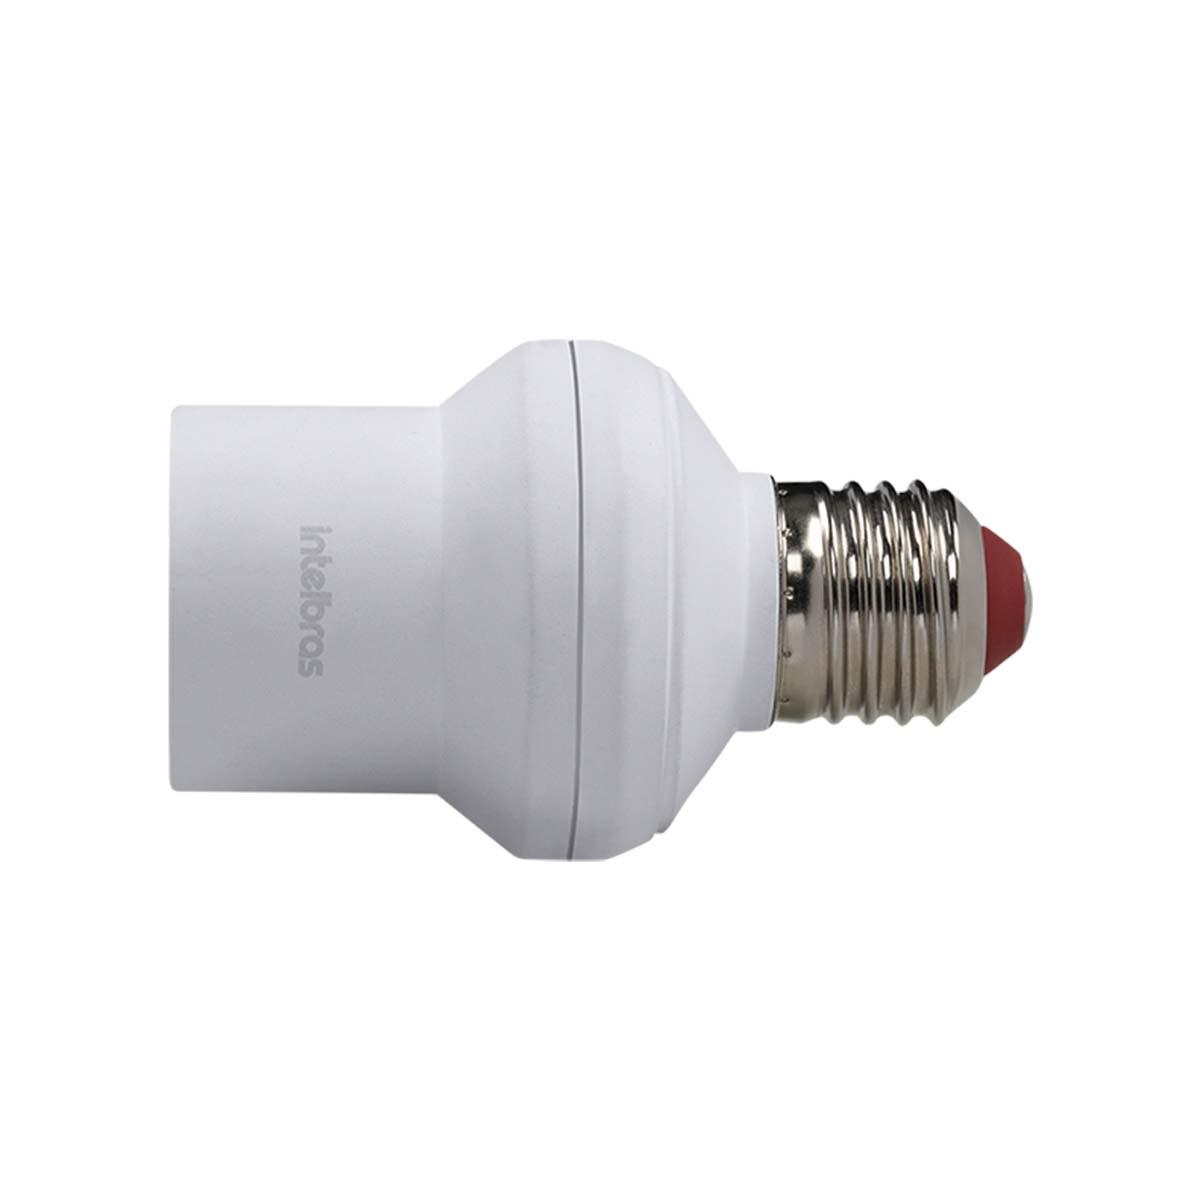 Interruptor Inteligente Soquete E27 Ews 400  Intelbras